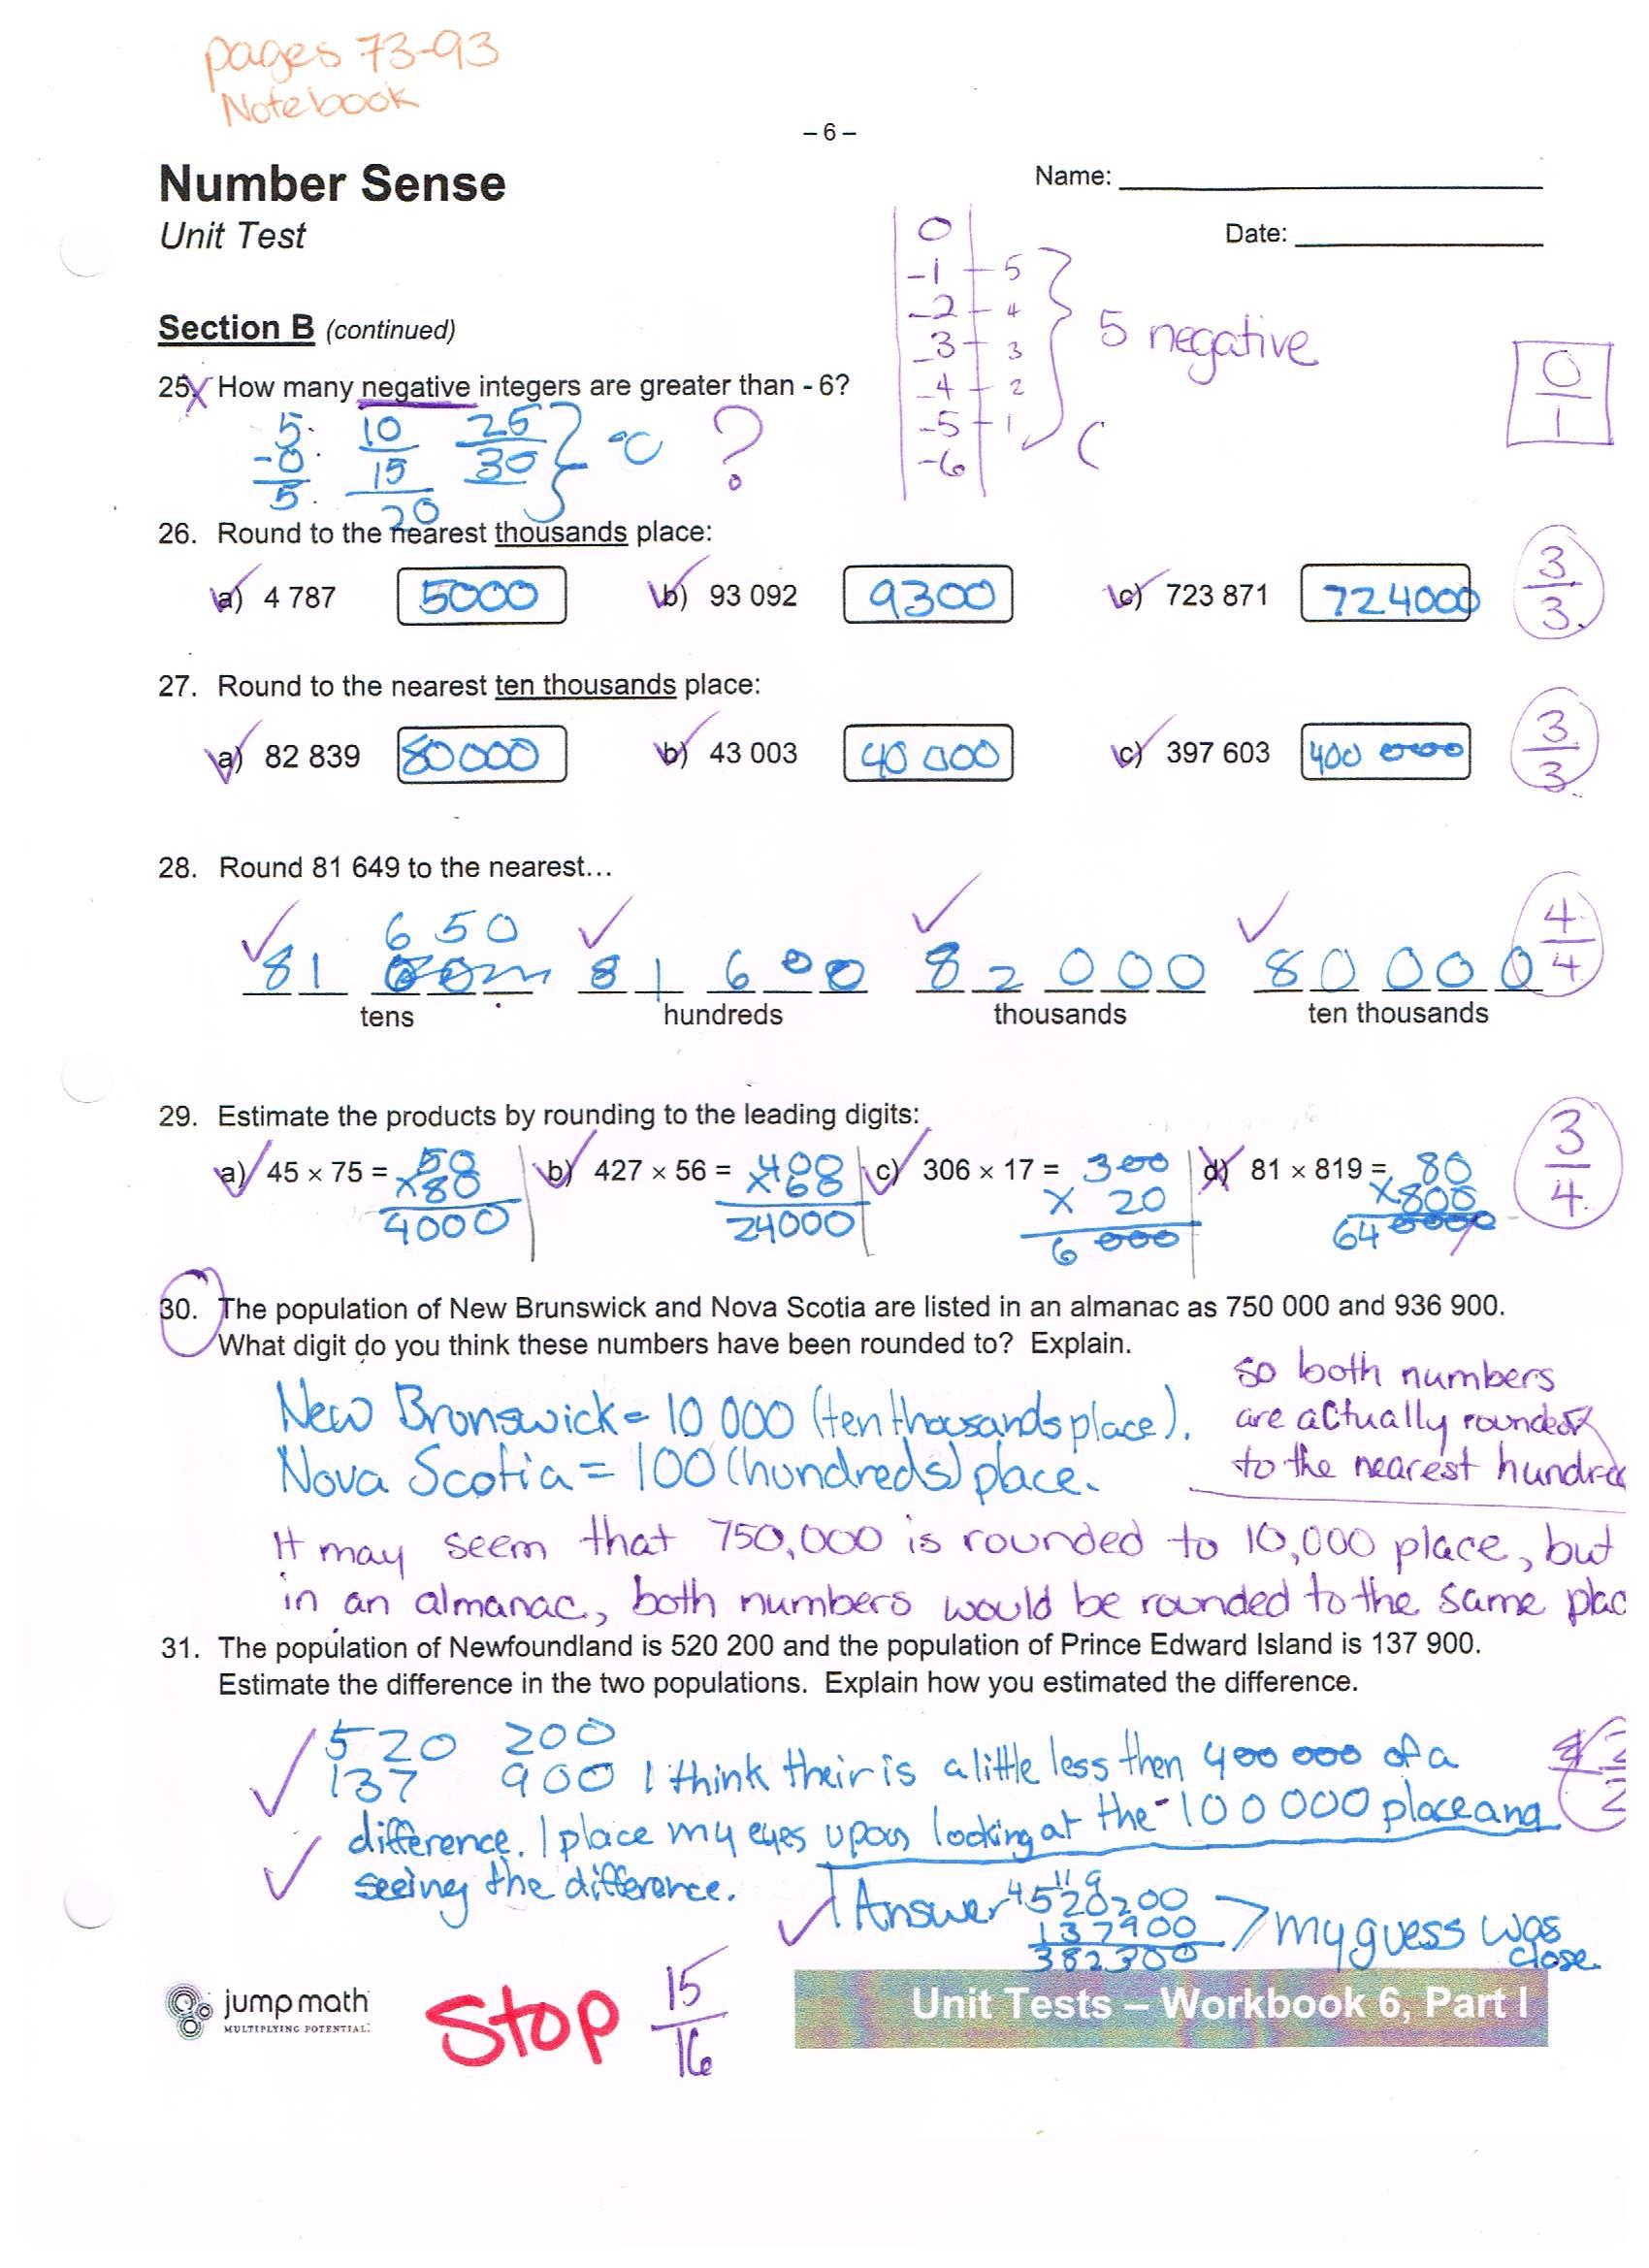 Jump Math 6 1 Number Sense Unit Test